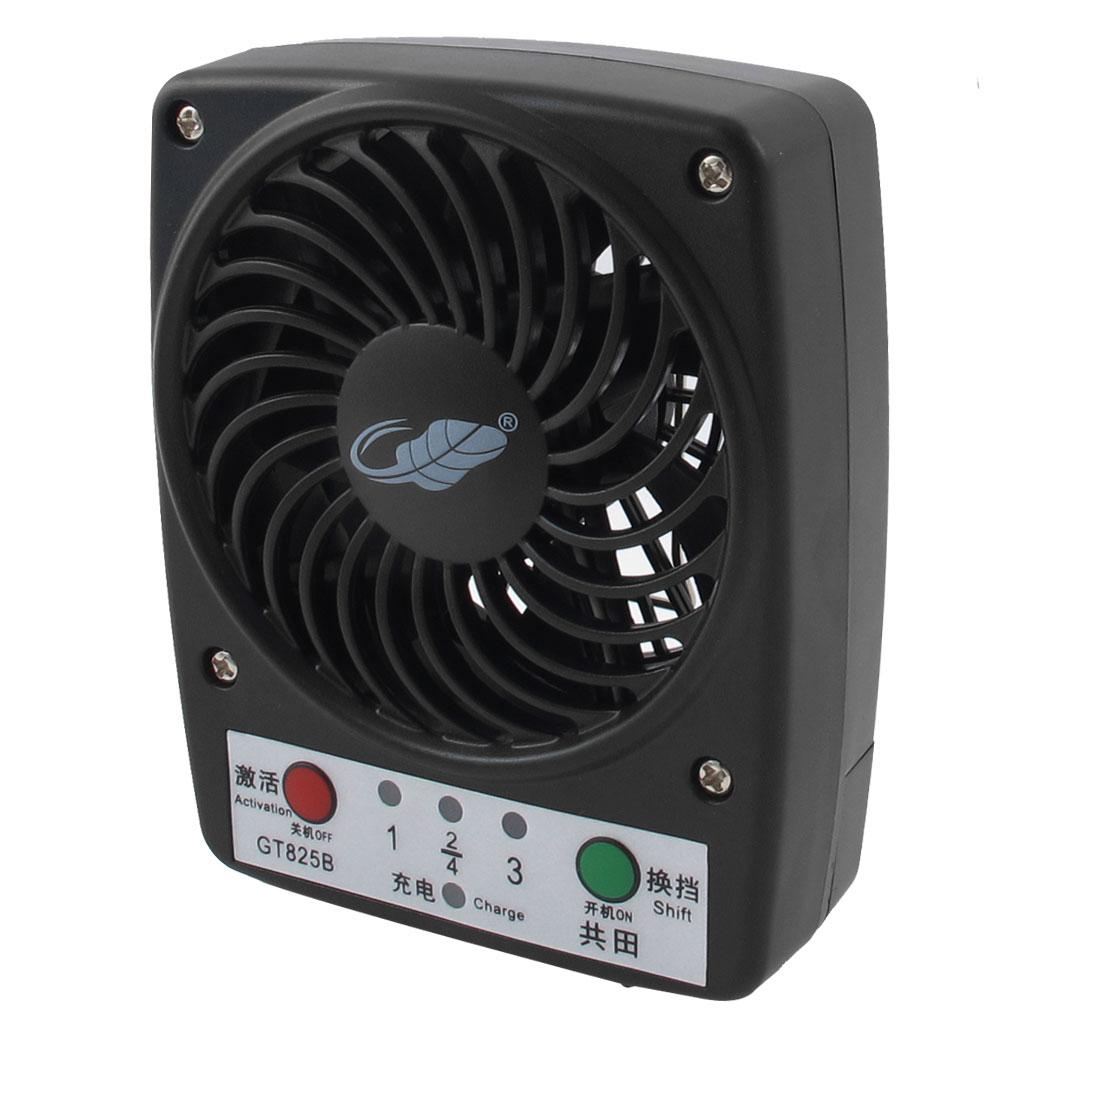 DC5V 4W Home Office Desk Portable Multifunction Mini Cooling Fan Black